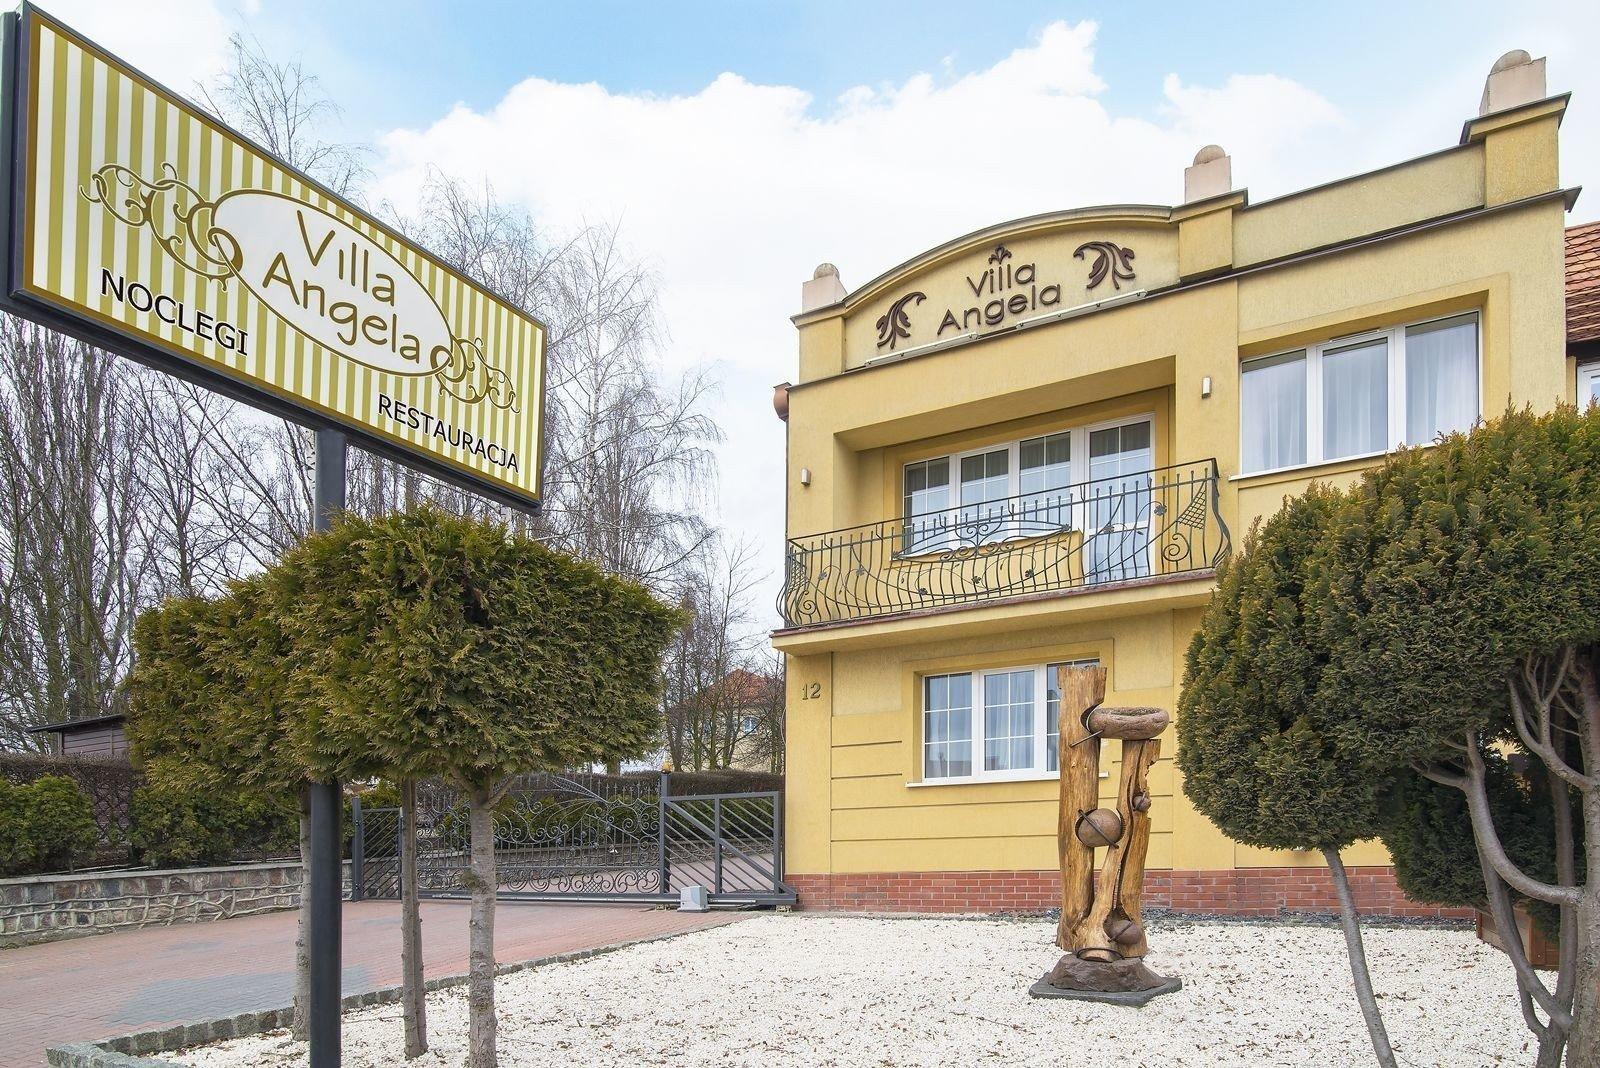 Villa Angela Hotel